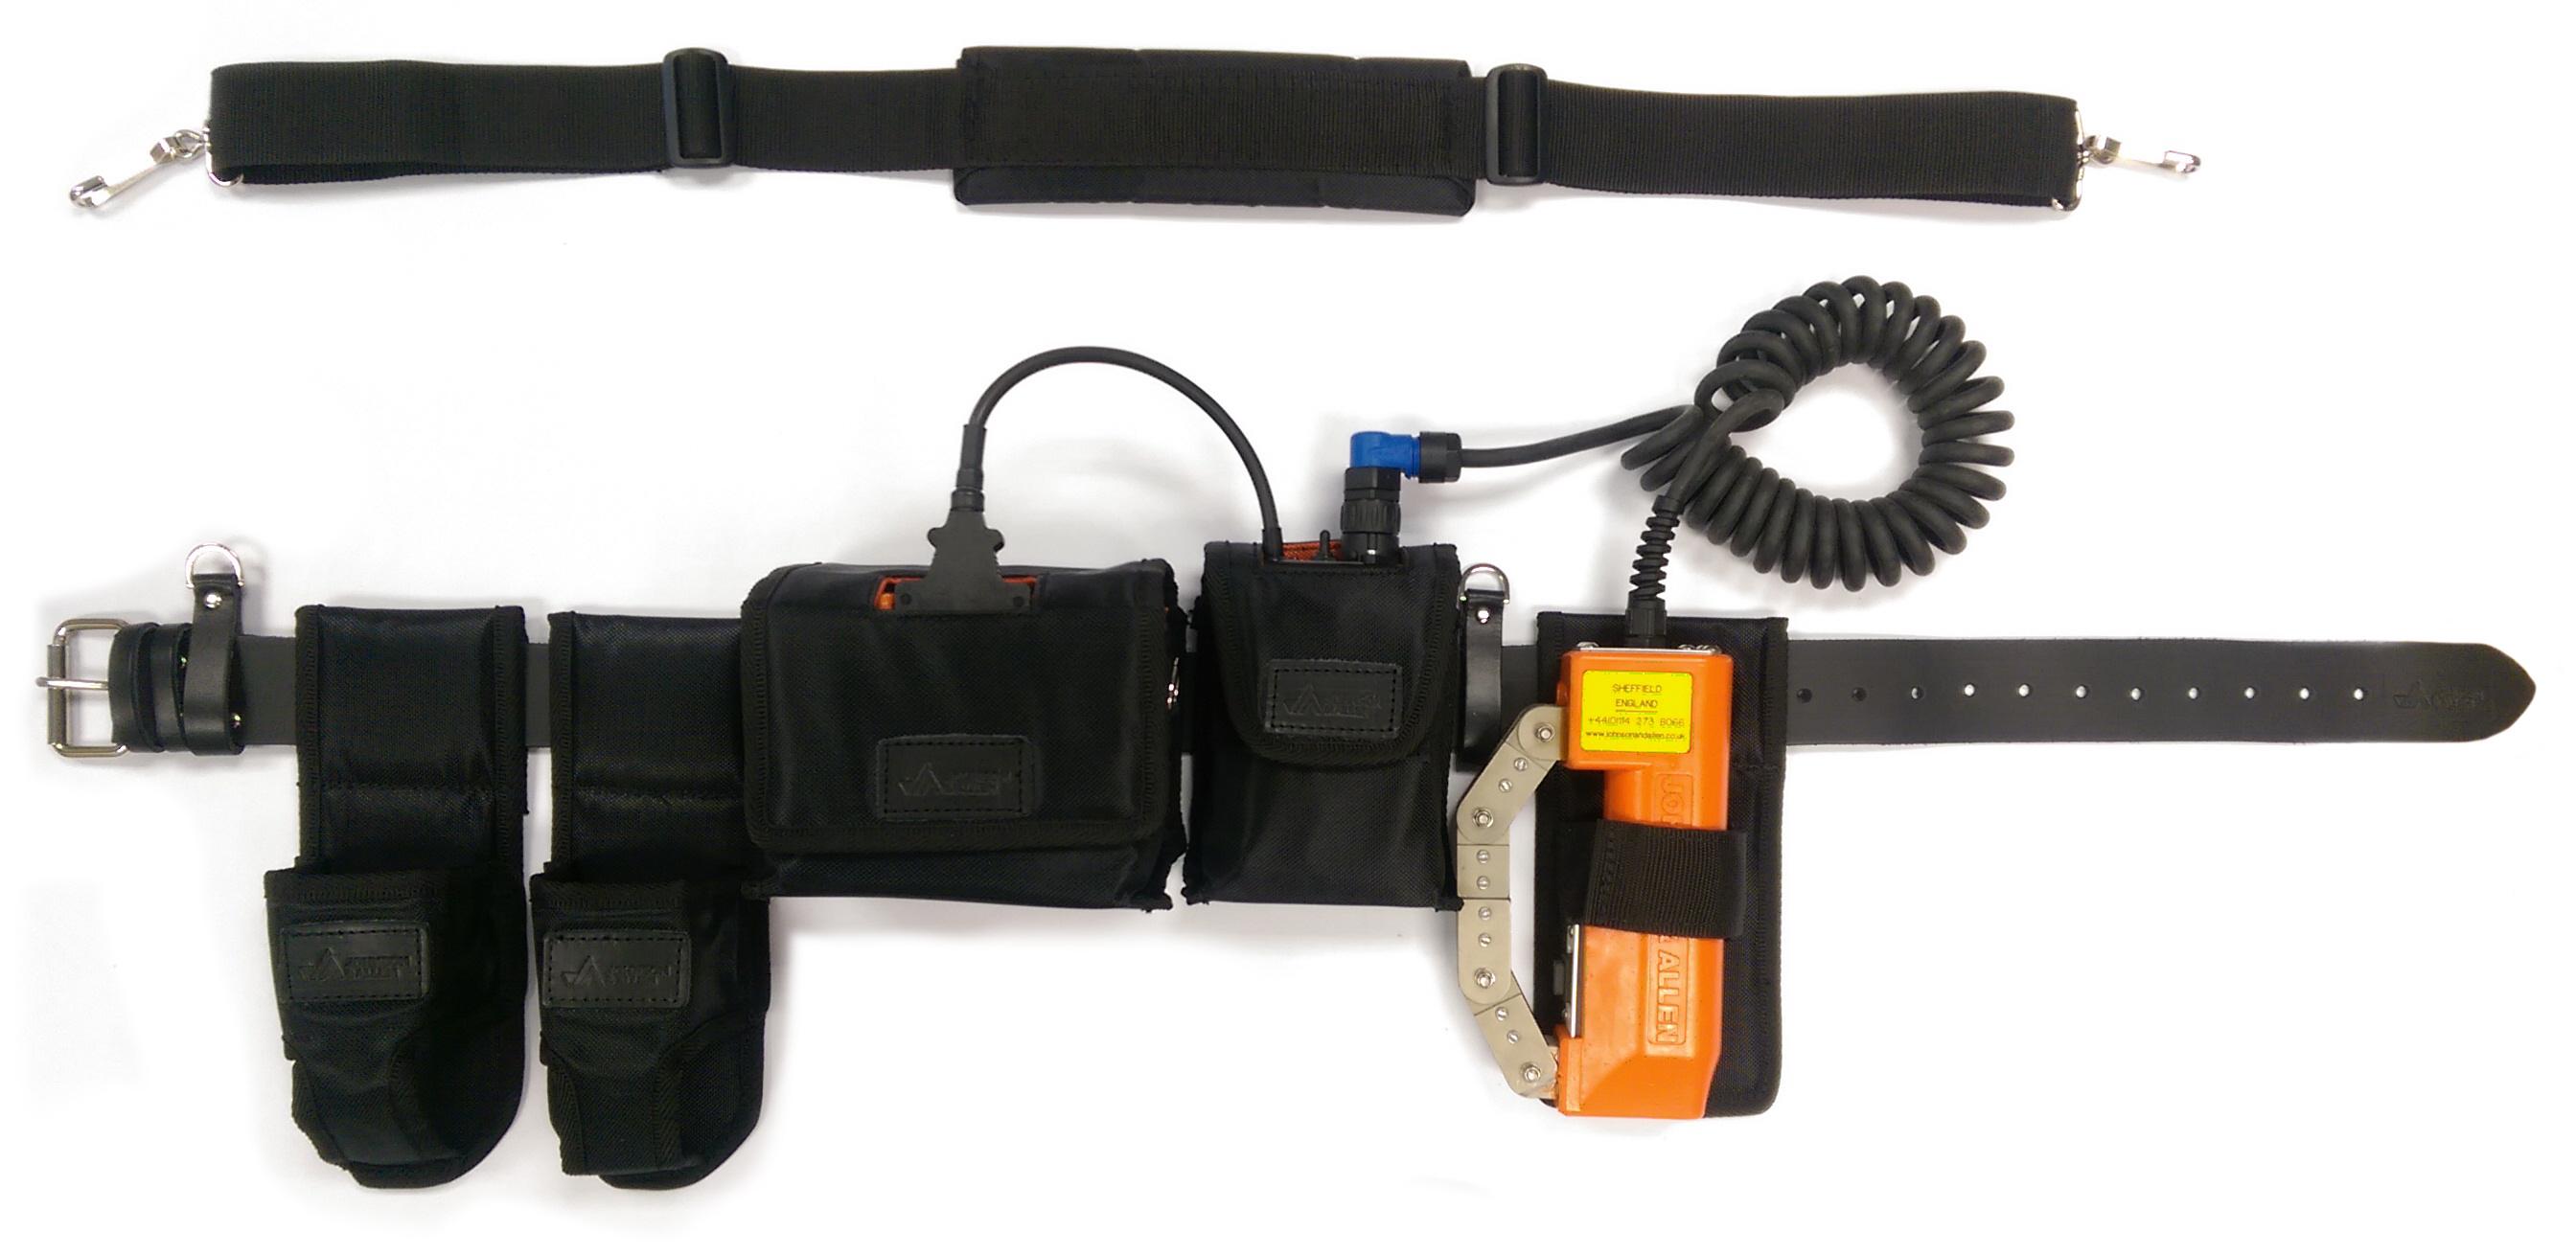 JAY-PAC - Battery Powered NDT Yoke Pack (belt form)